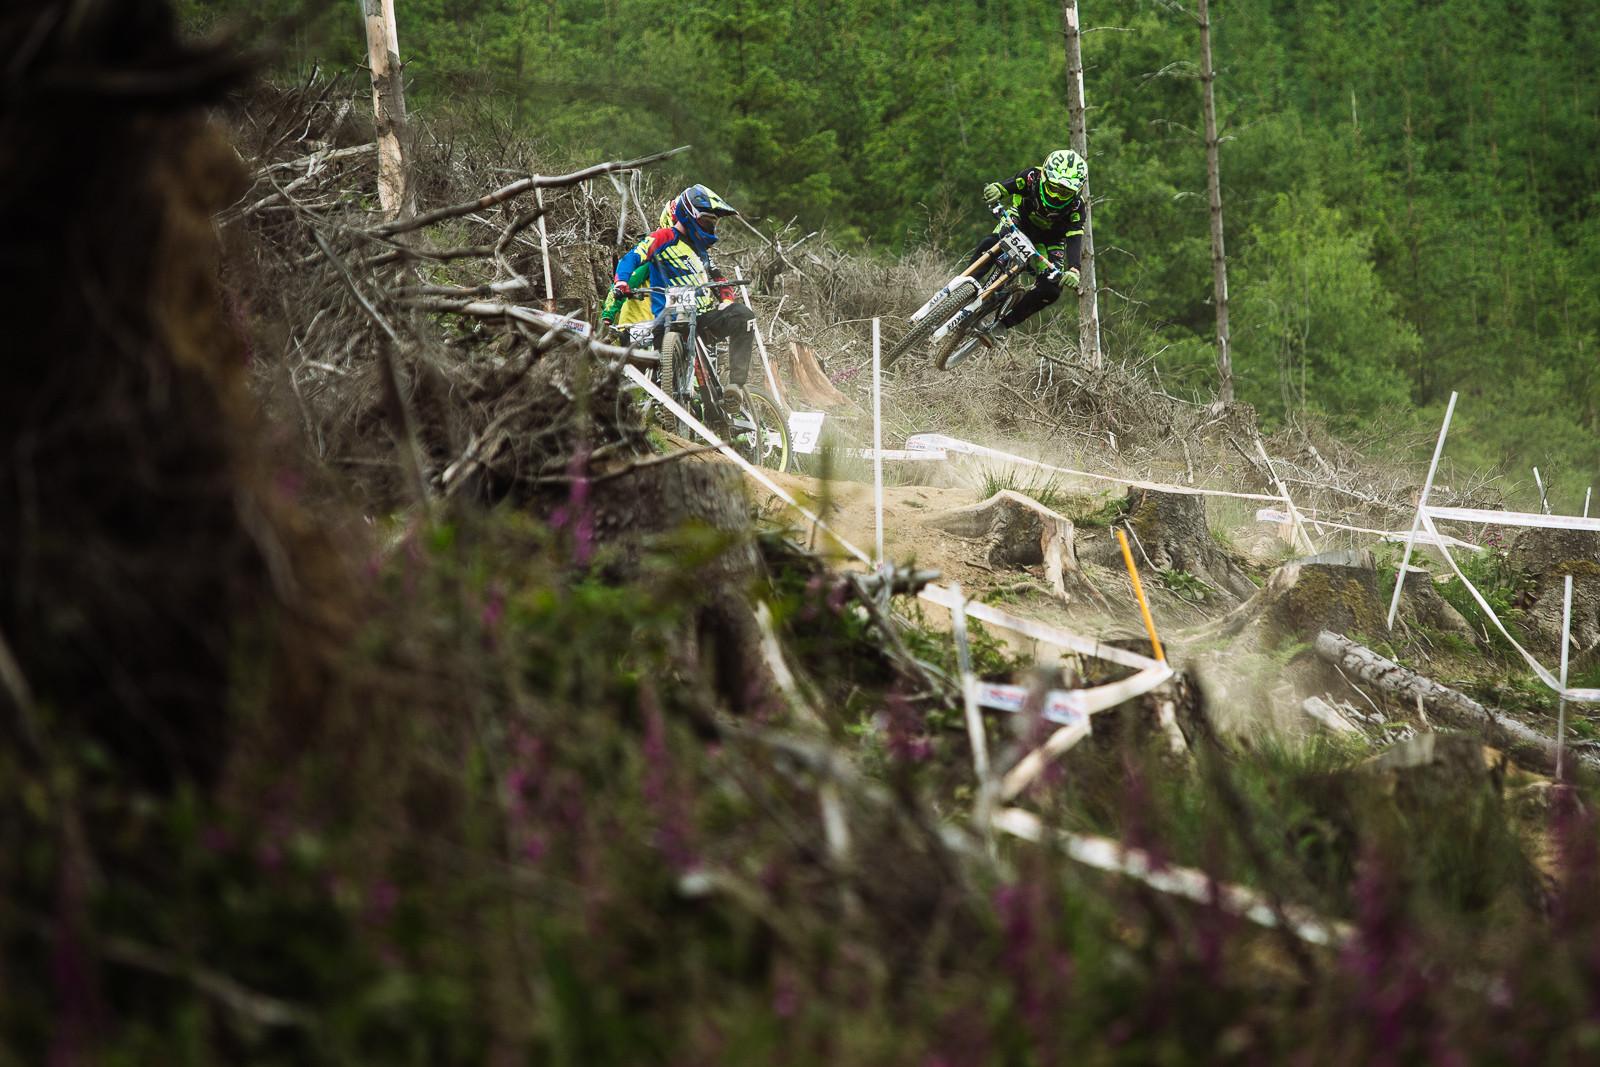 Kyle Hall, British DH Series, Bala - RACE REPORT - 2015 British Downhill Series Bala - Mountain Biking Pictures - Vital MTB